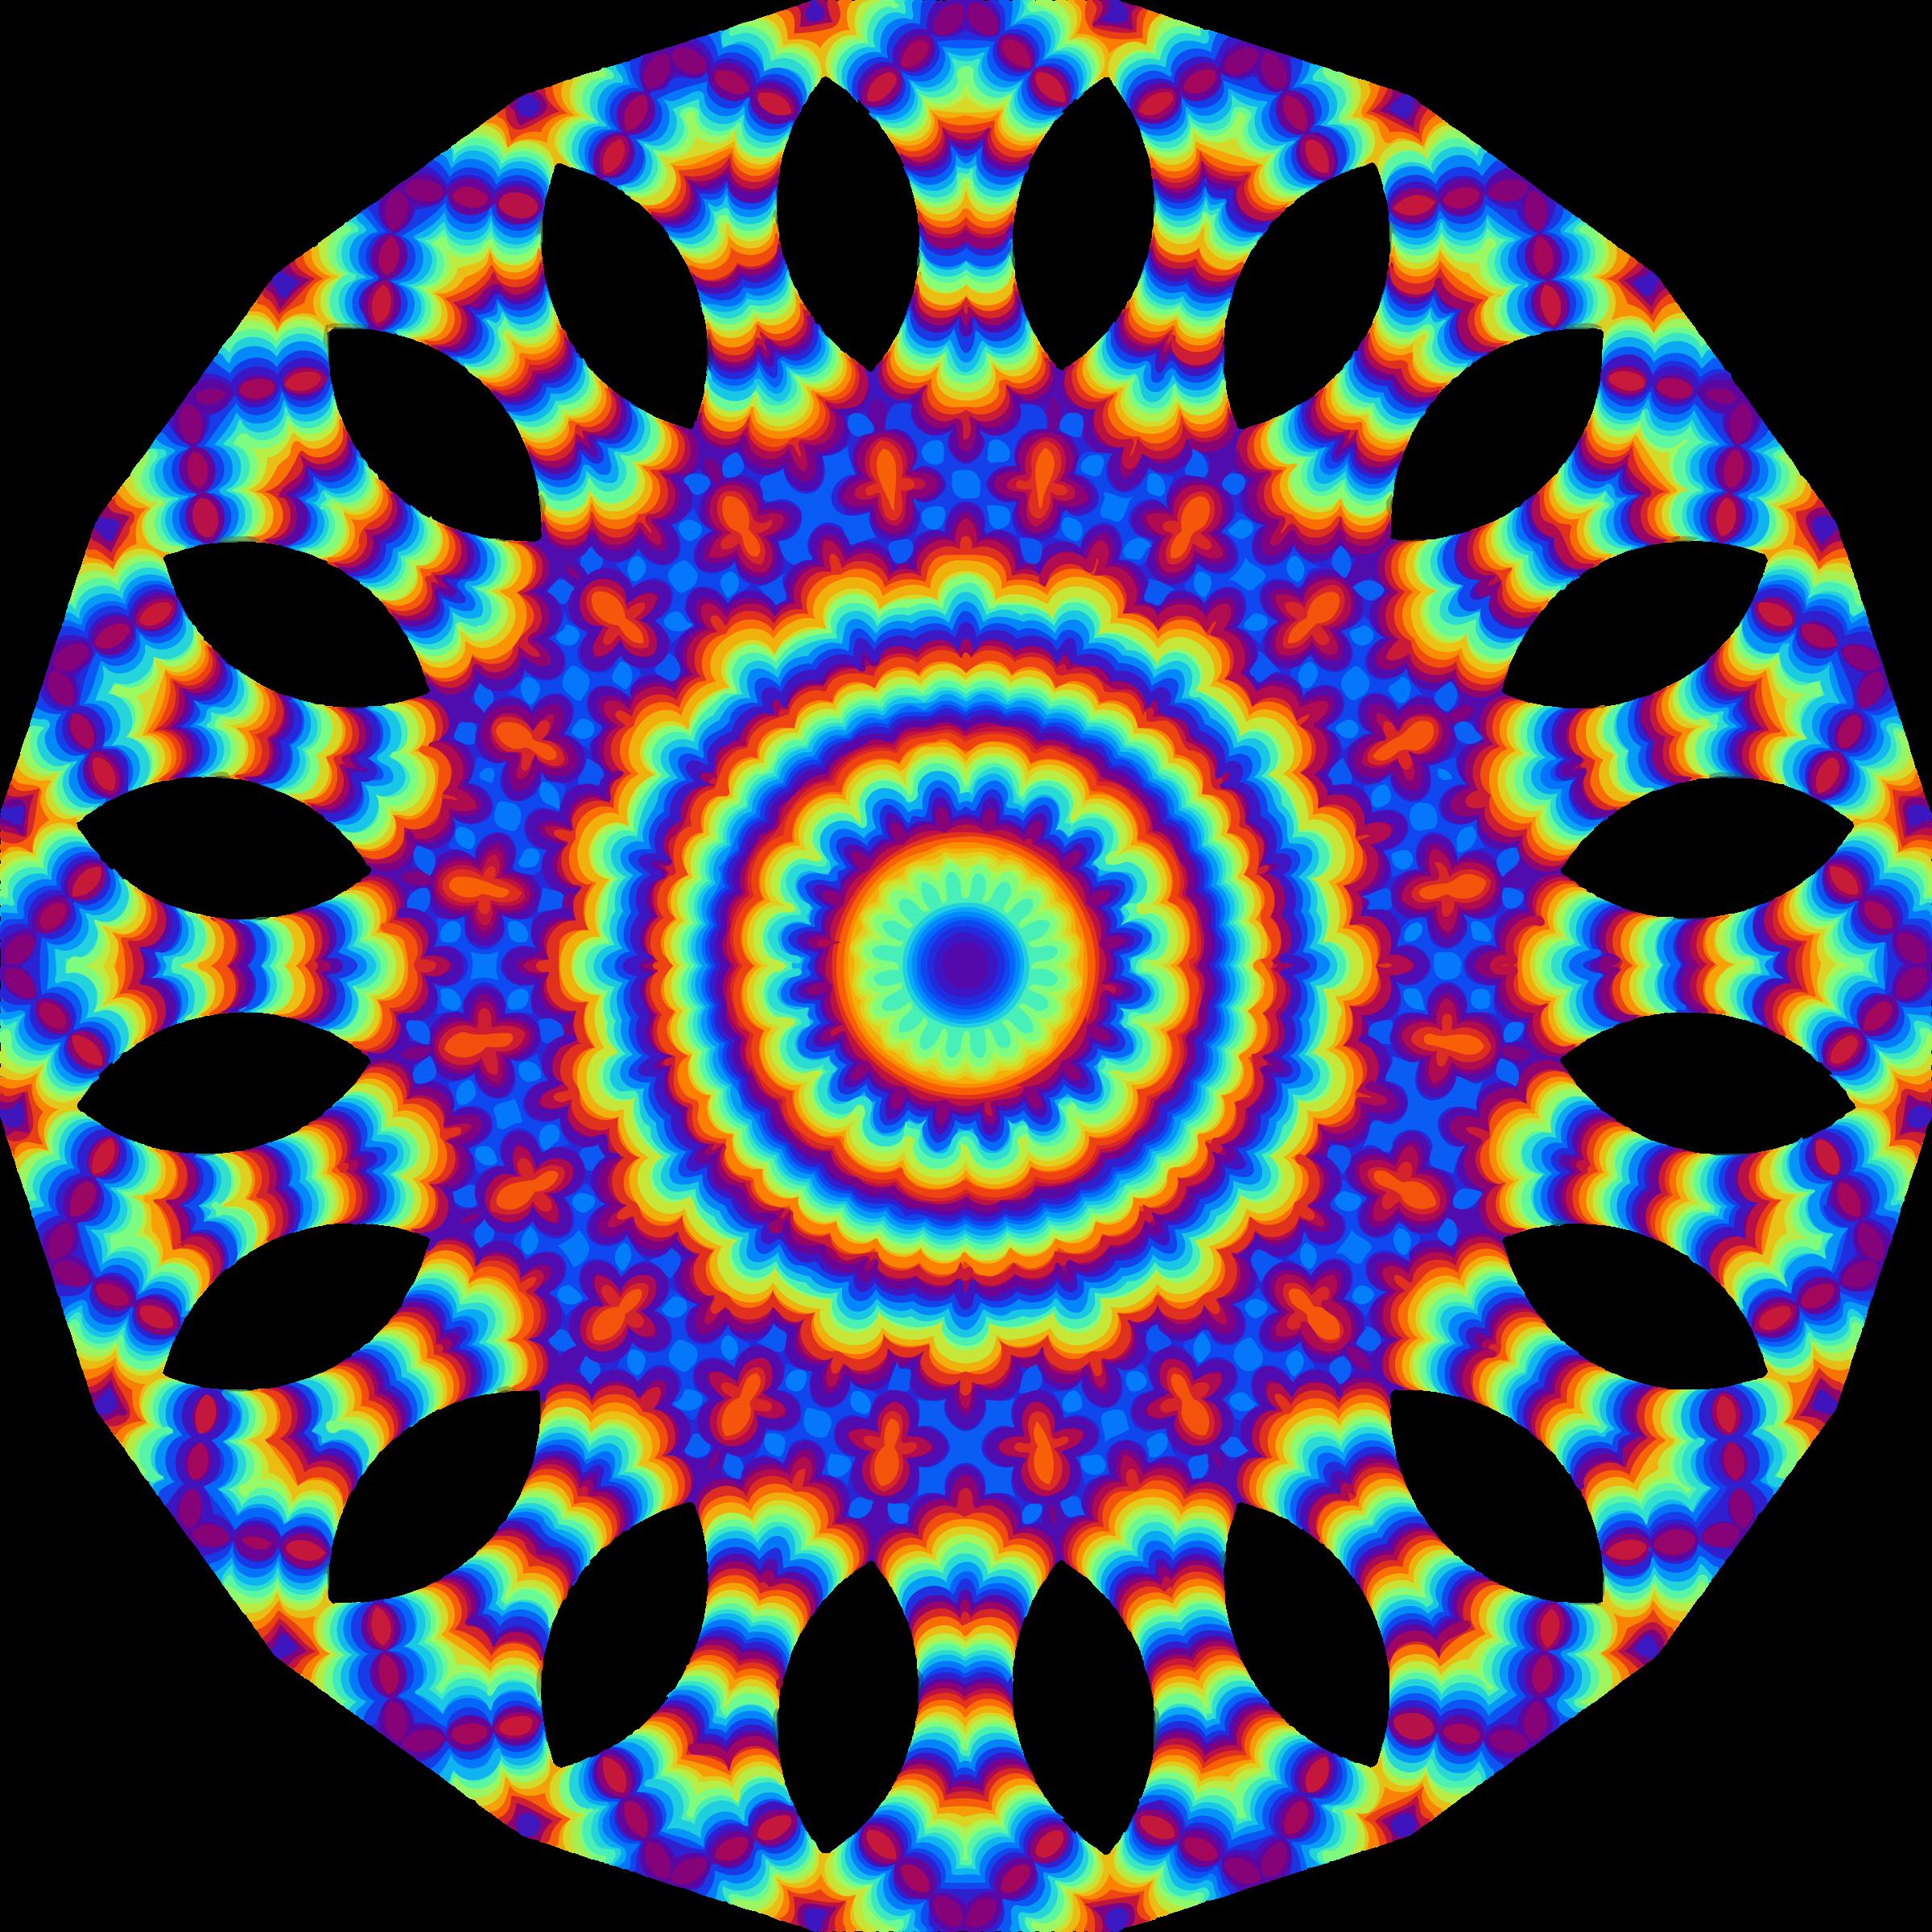 7 clipart colourful. Mandala big image png